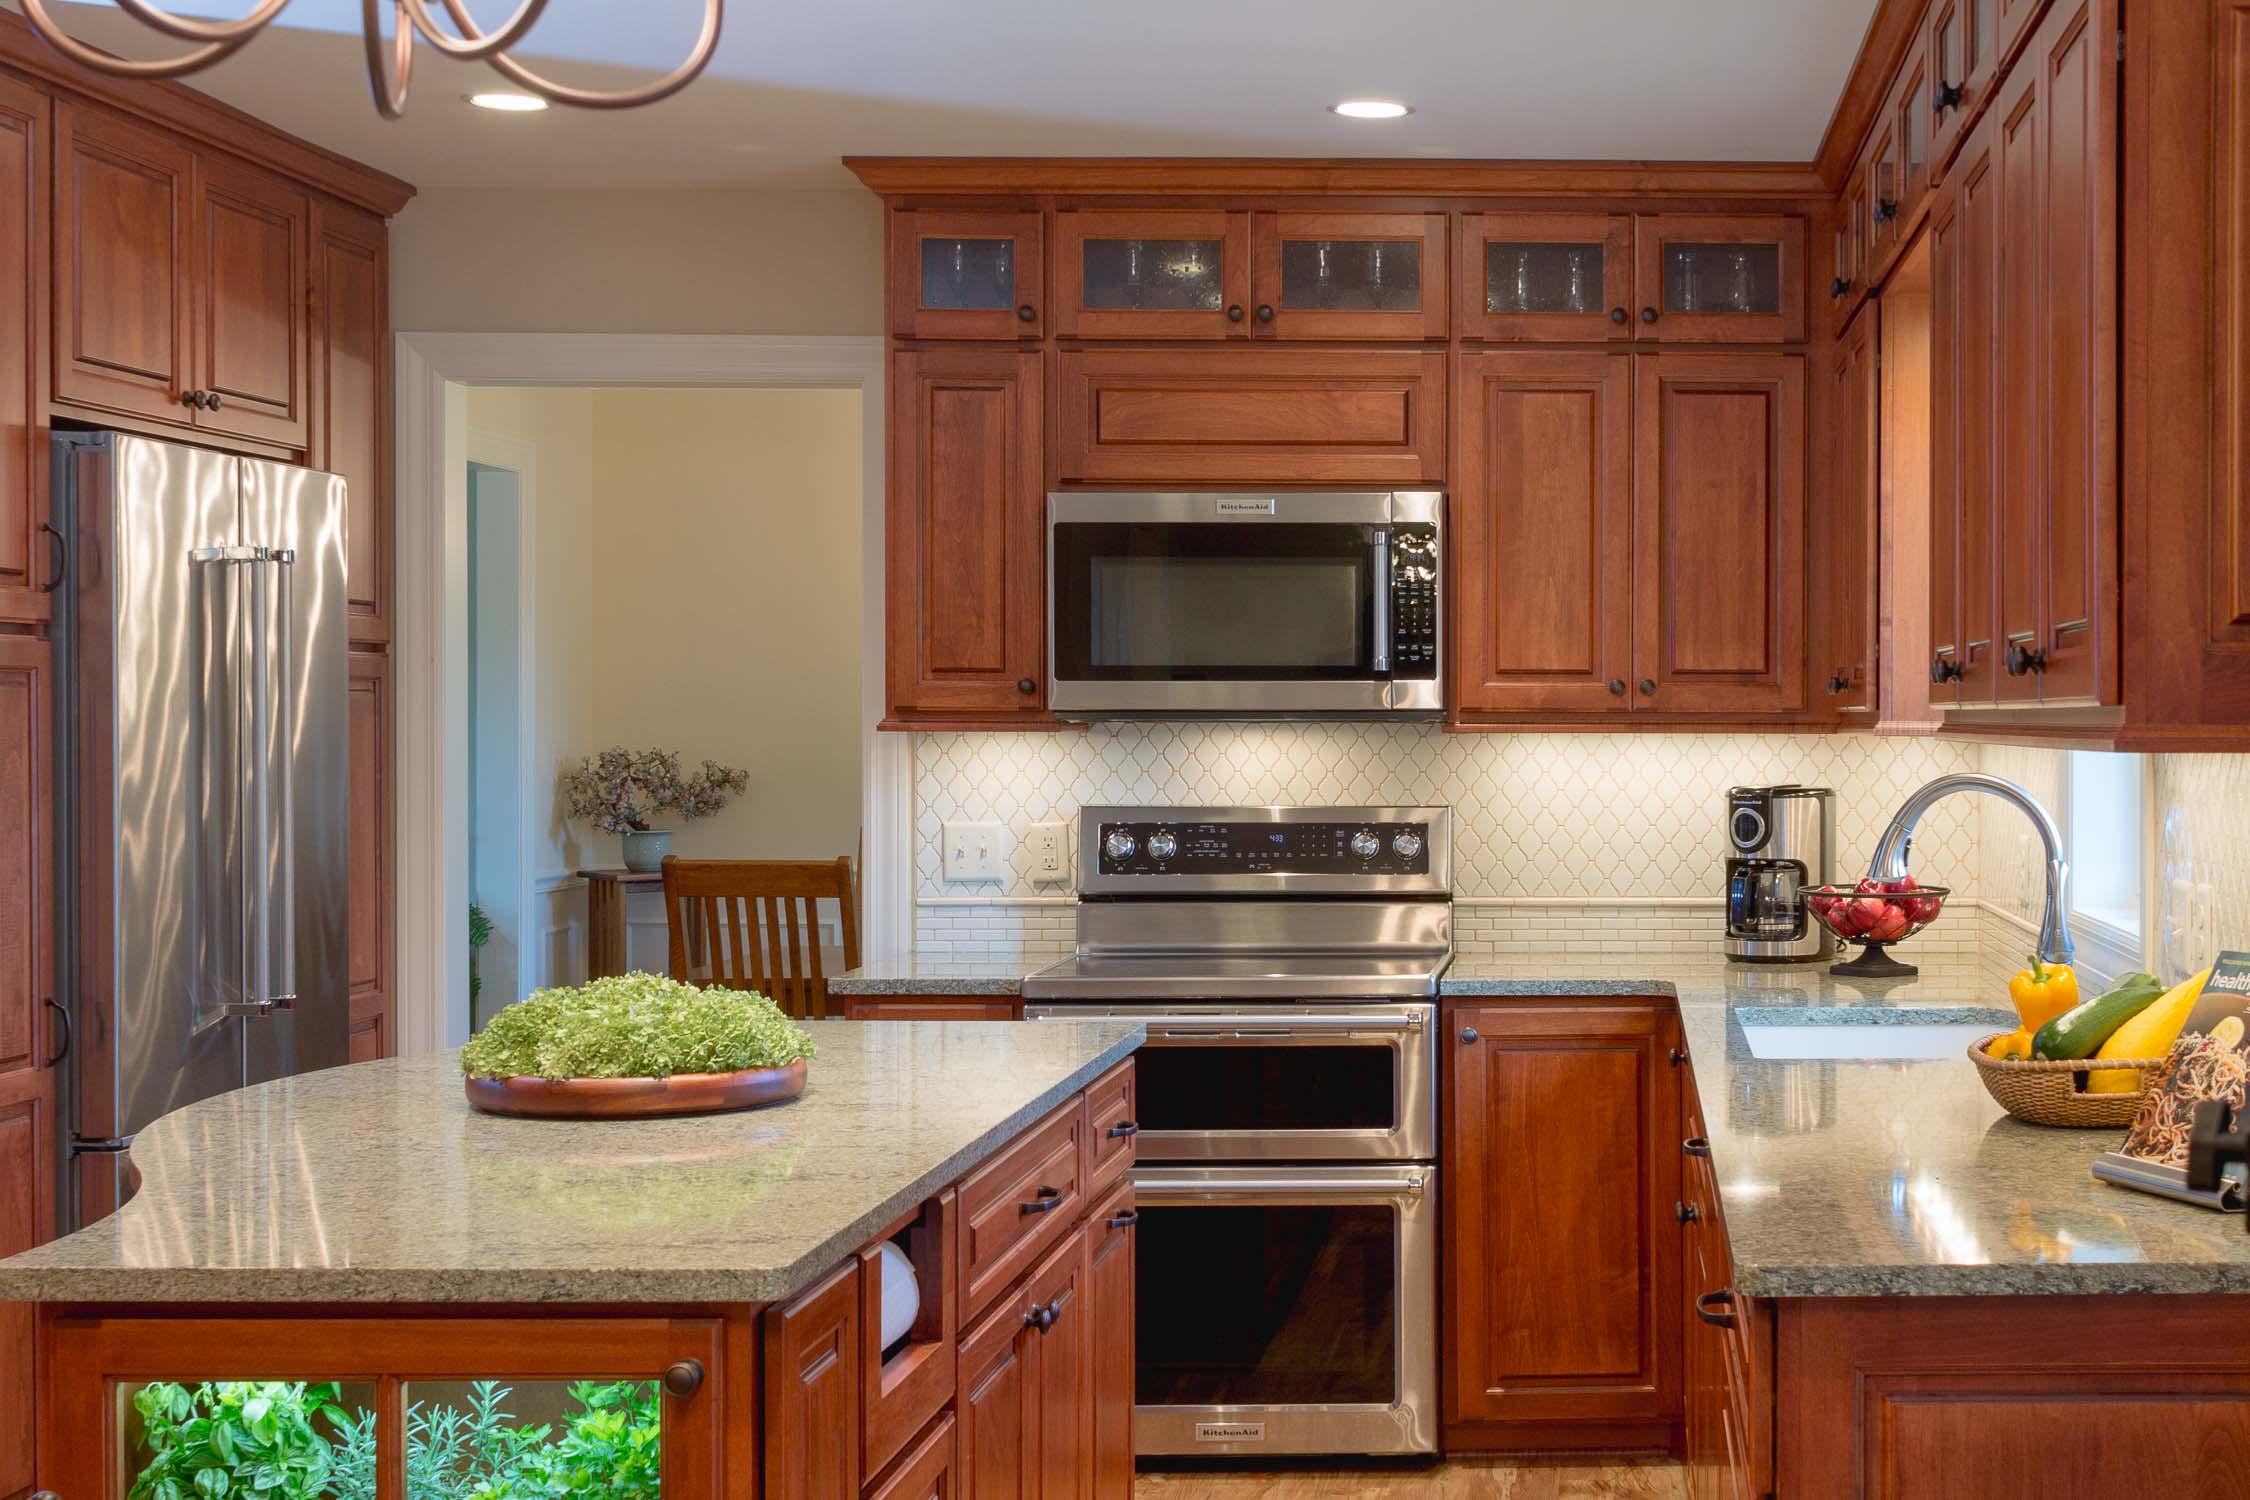 Traditional Kitchen Design with Six Burner Range